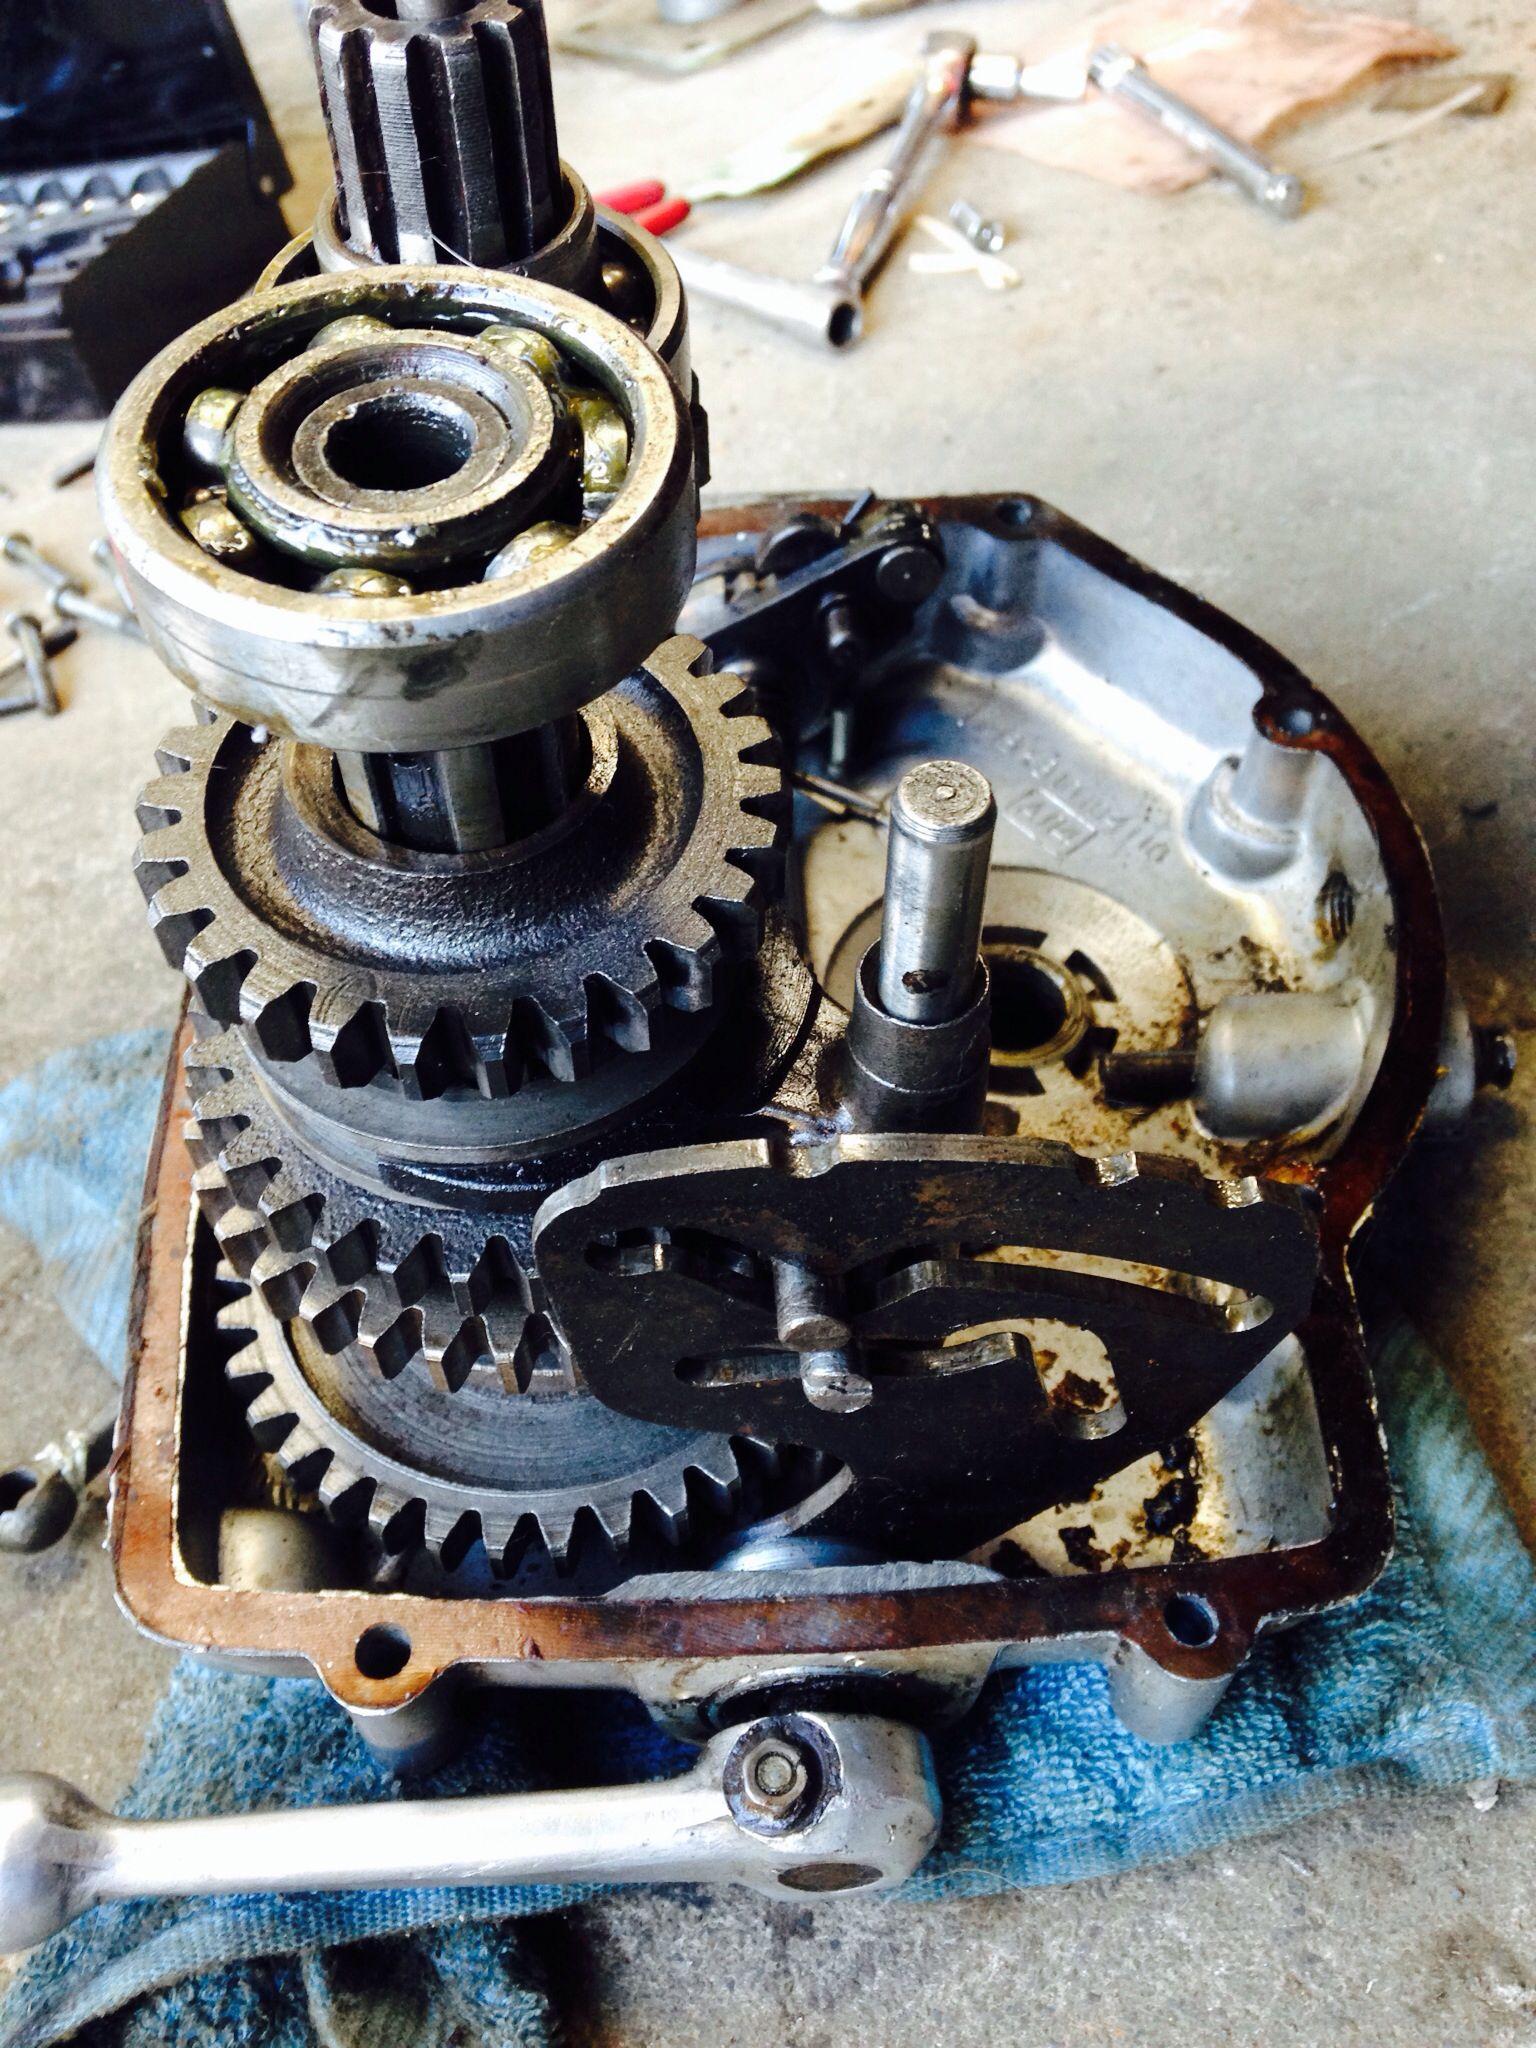 medium resolution of ural gearbox russian motorcycle